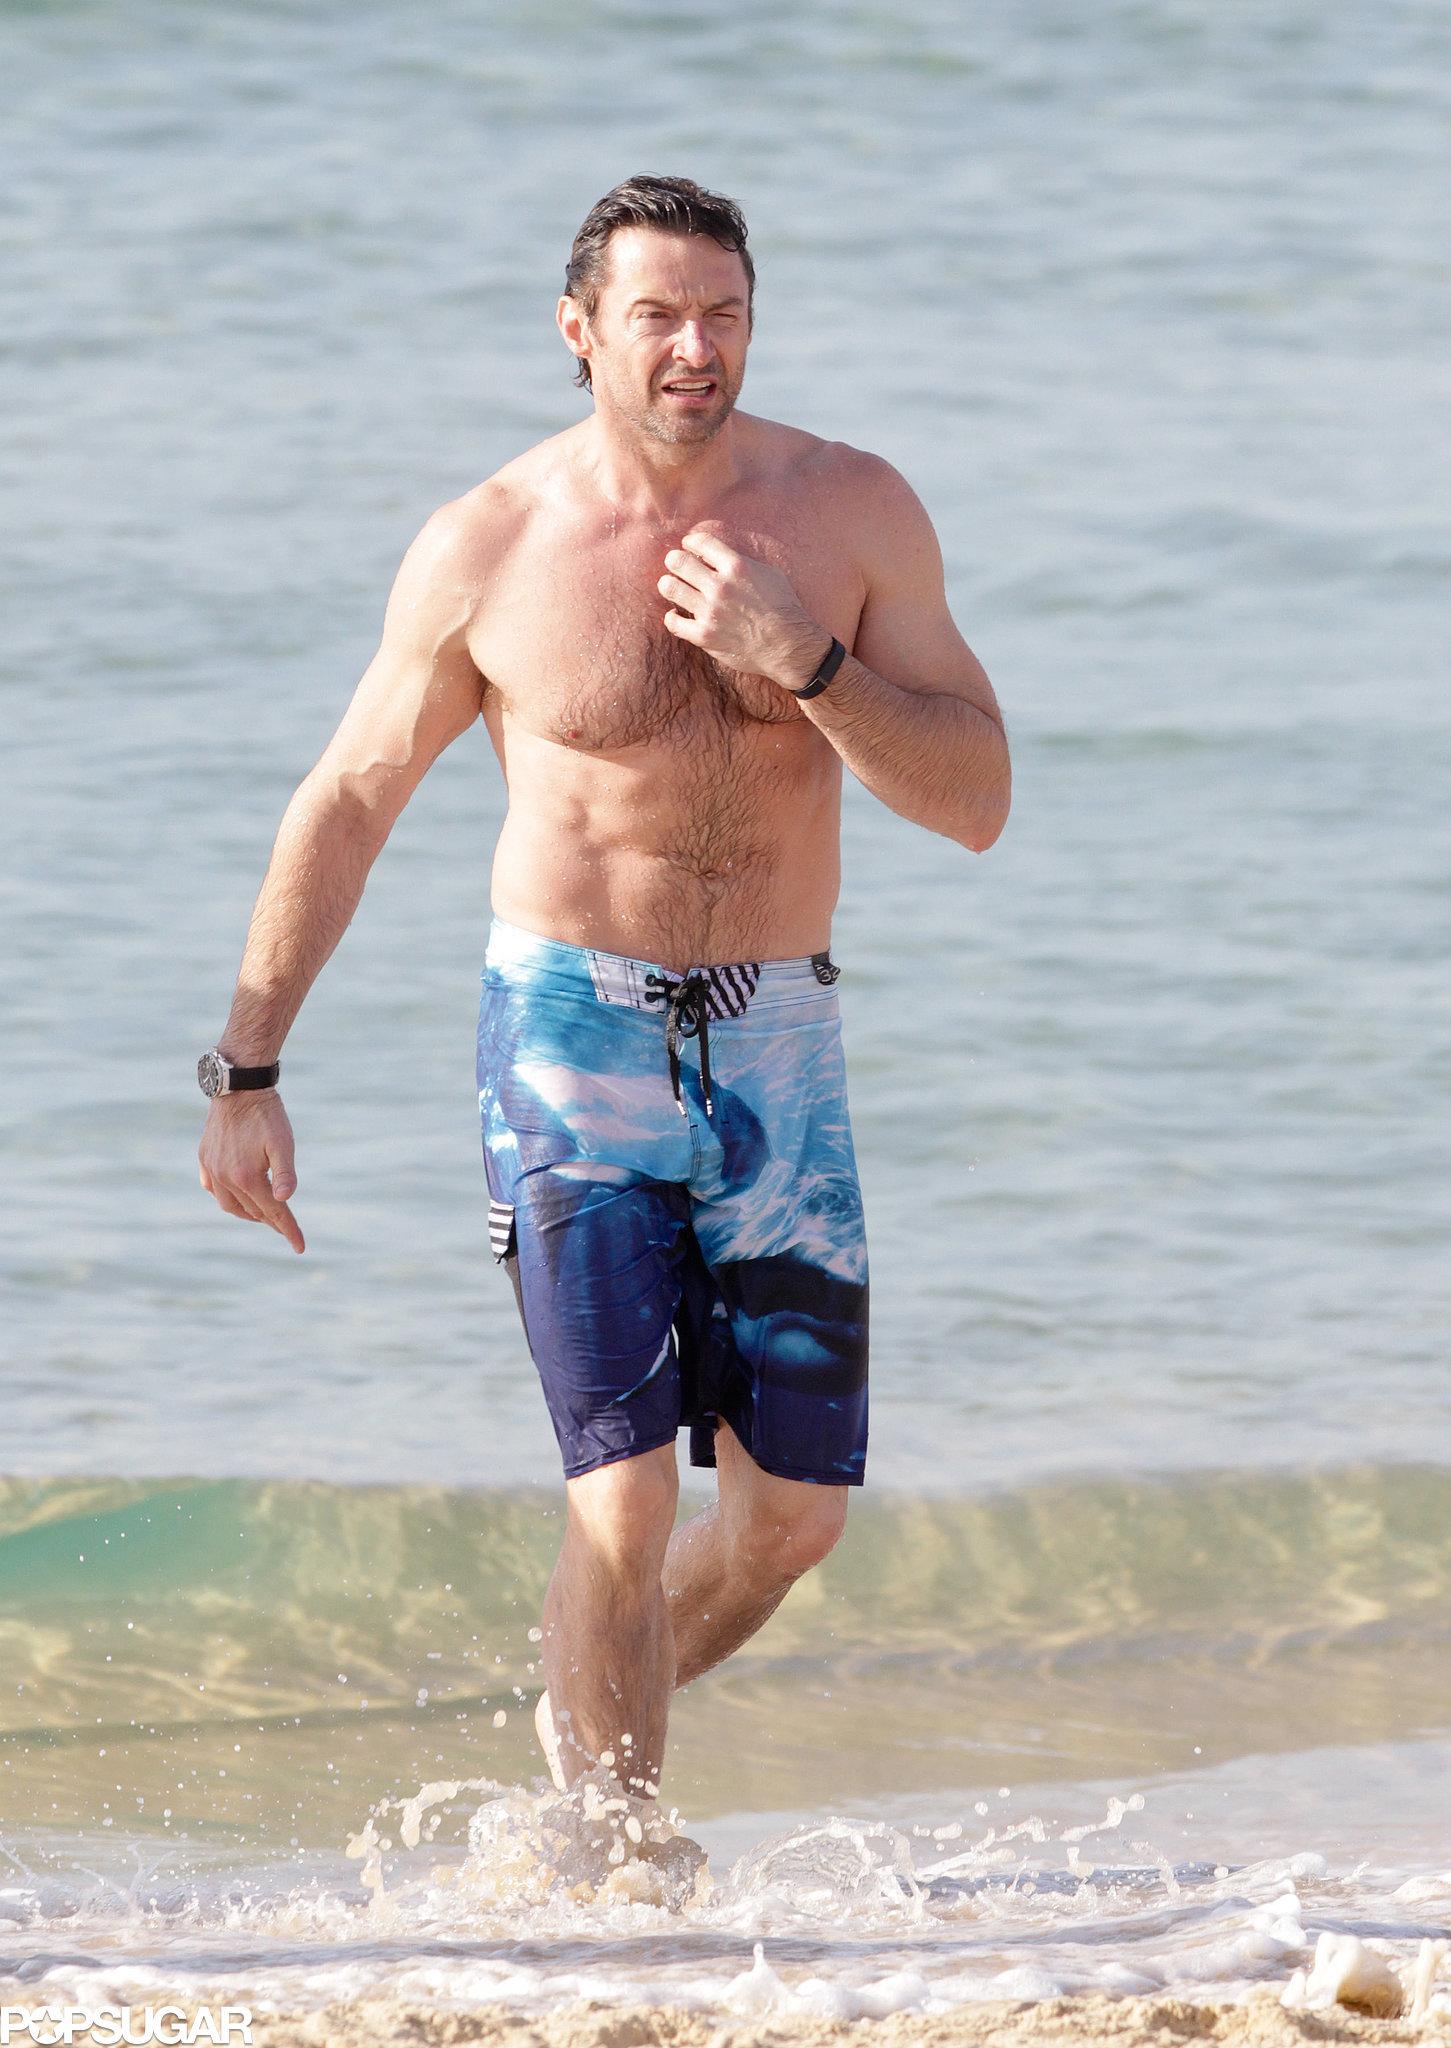 Hugh Jackman Was Always Hot, Even When He Was Stick Thin